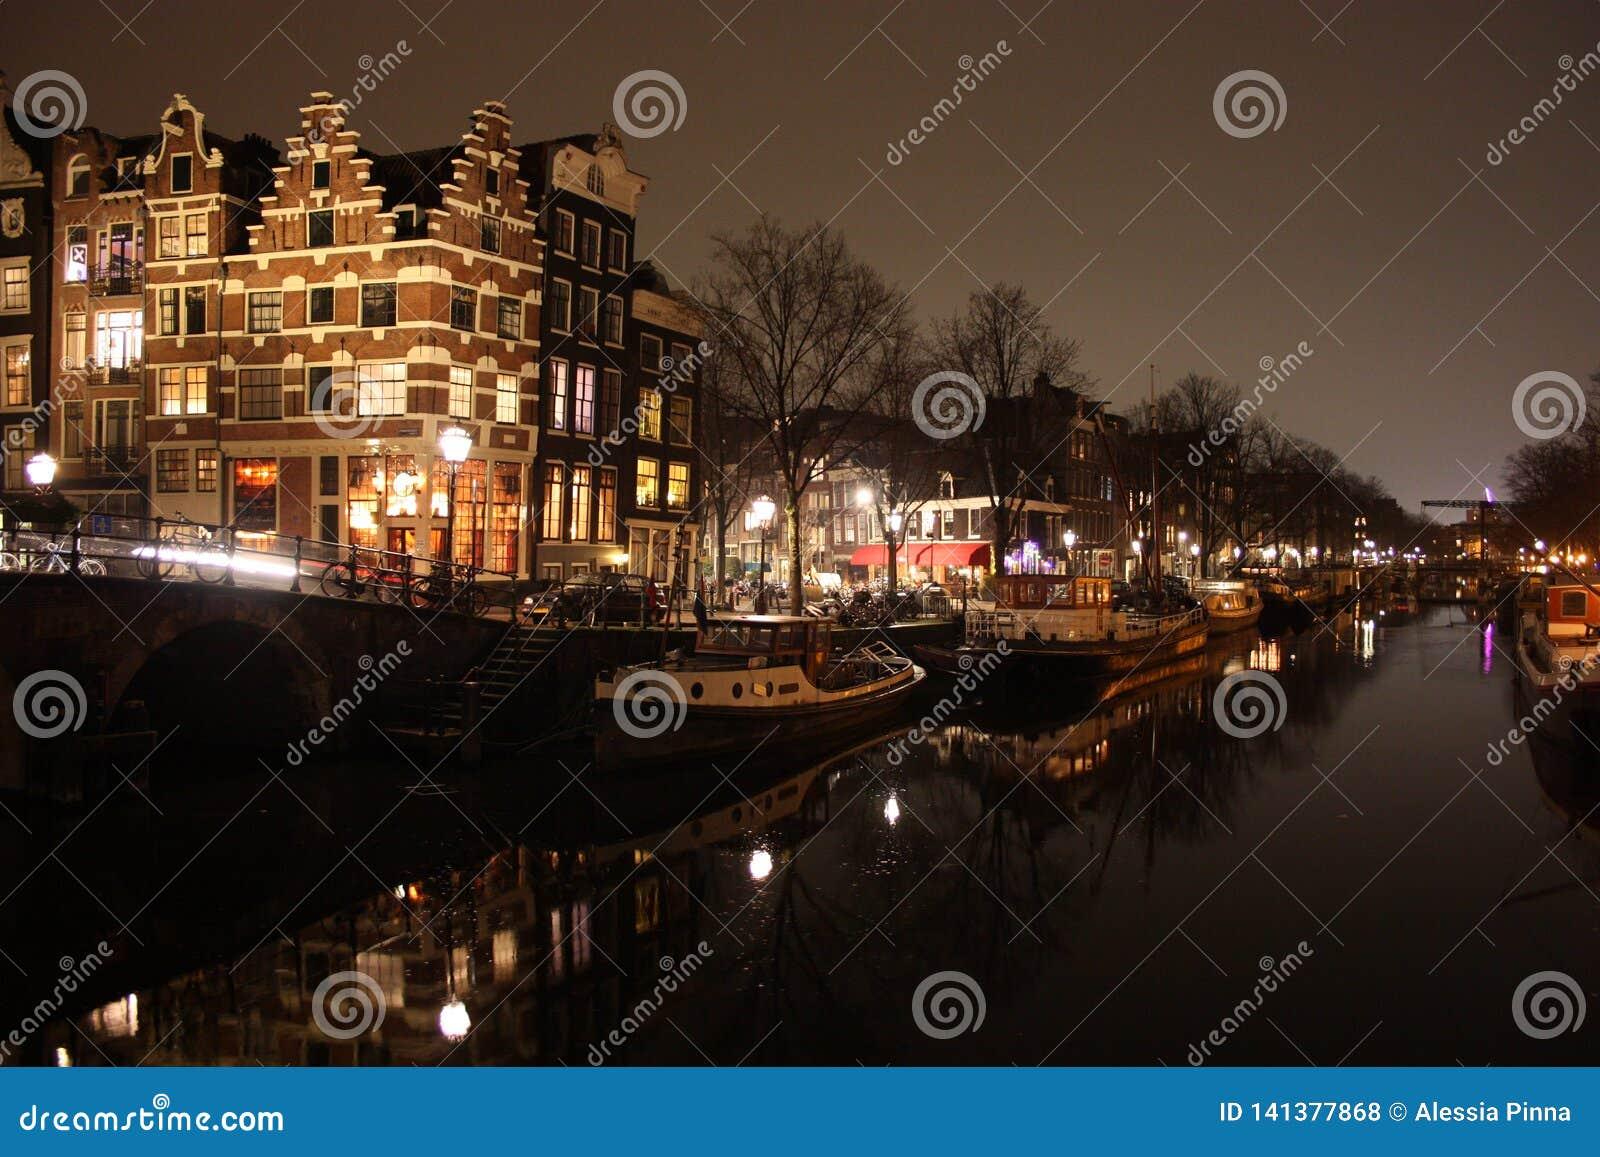 Famous bridge in amsterdam. romantic night landscape. a bit of haze and fog makes the magic channel